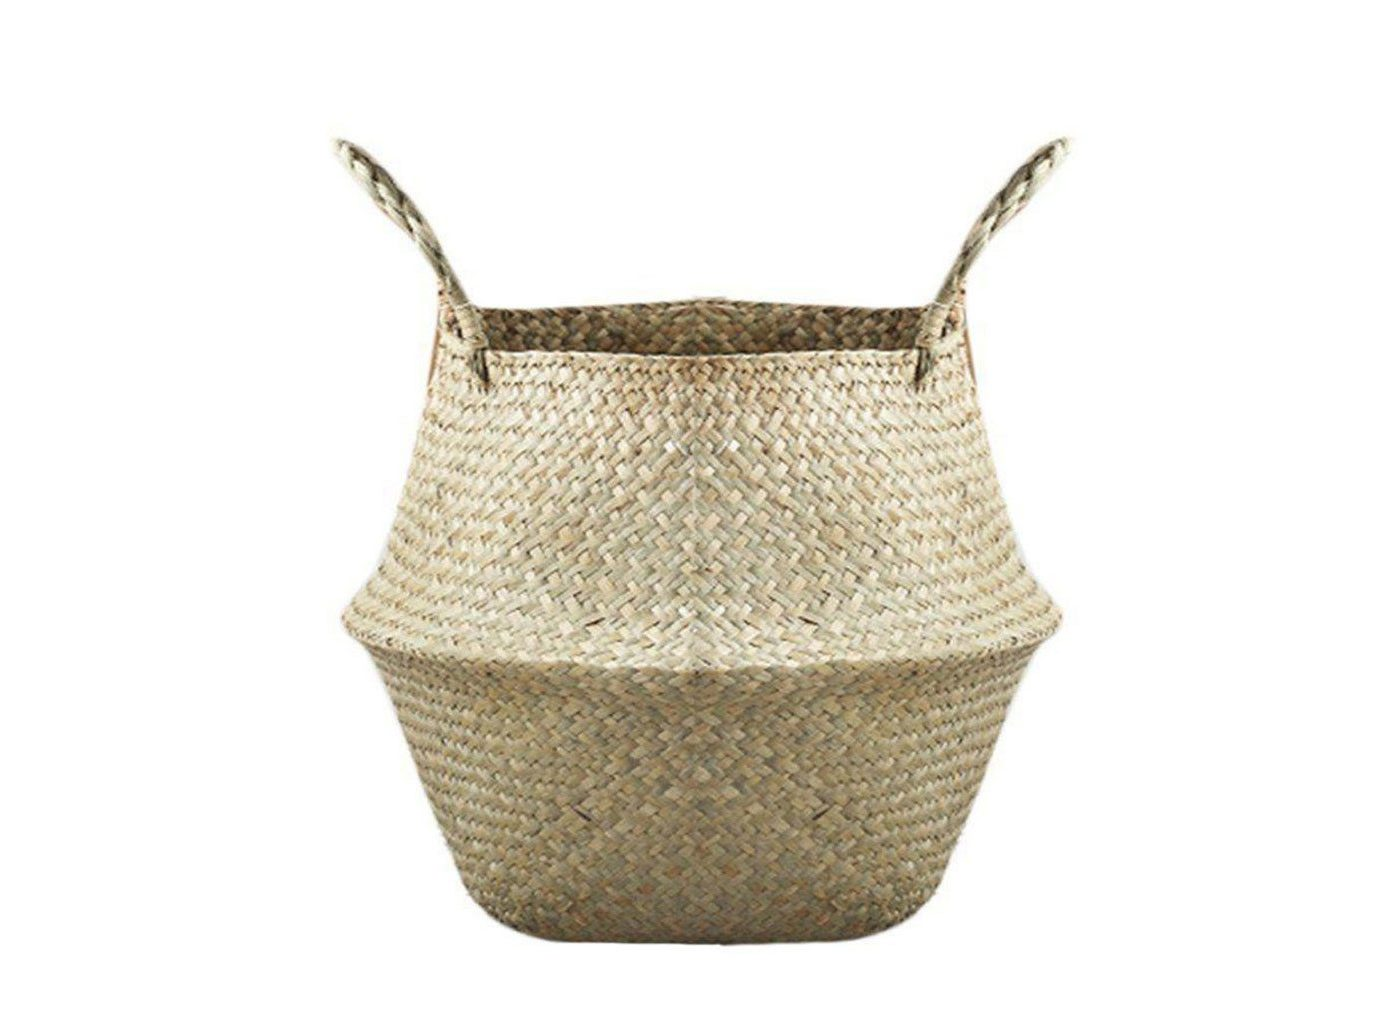 City Copenhagen Kyoto Marrakech Palm Springs Style + Design Travel Shop Tulum kitchenware basket product product design